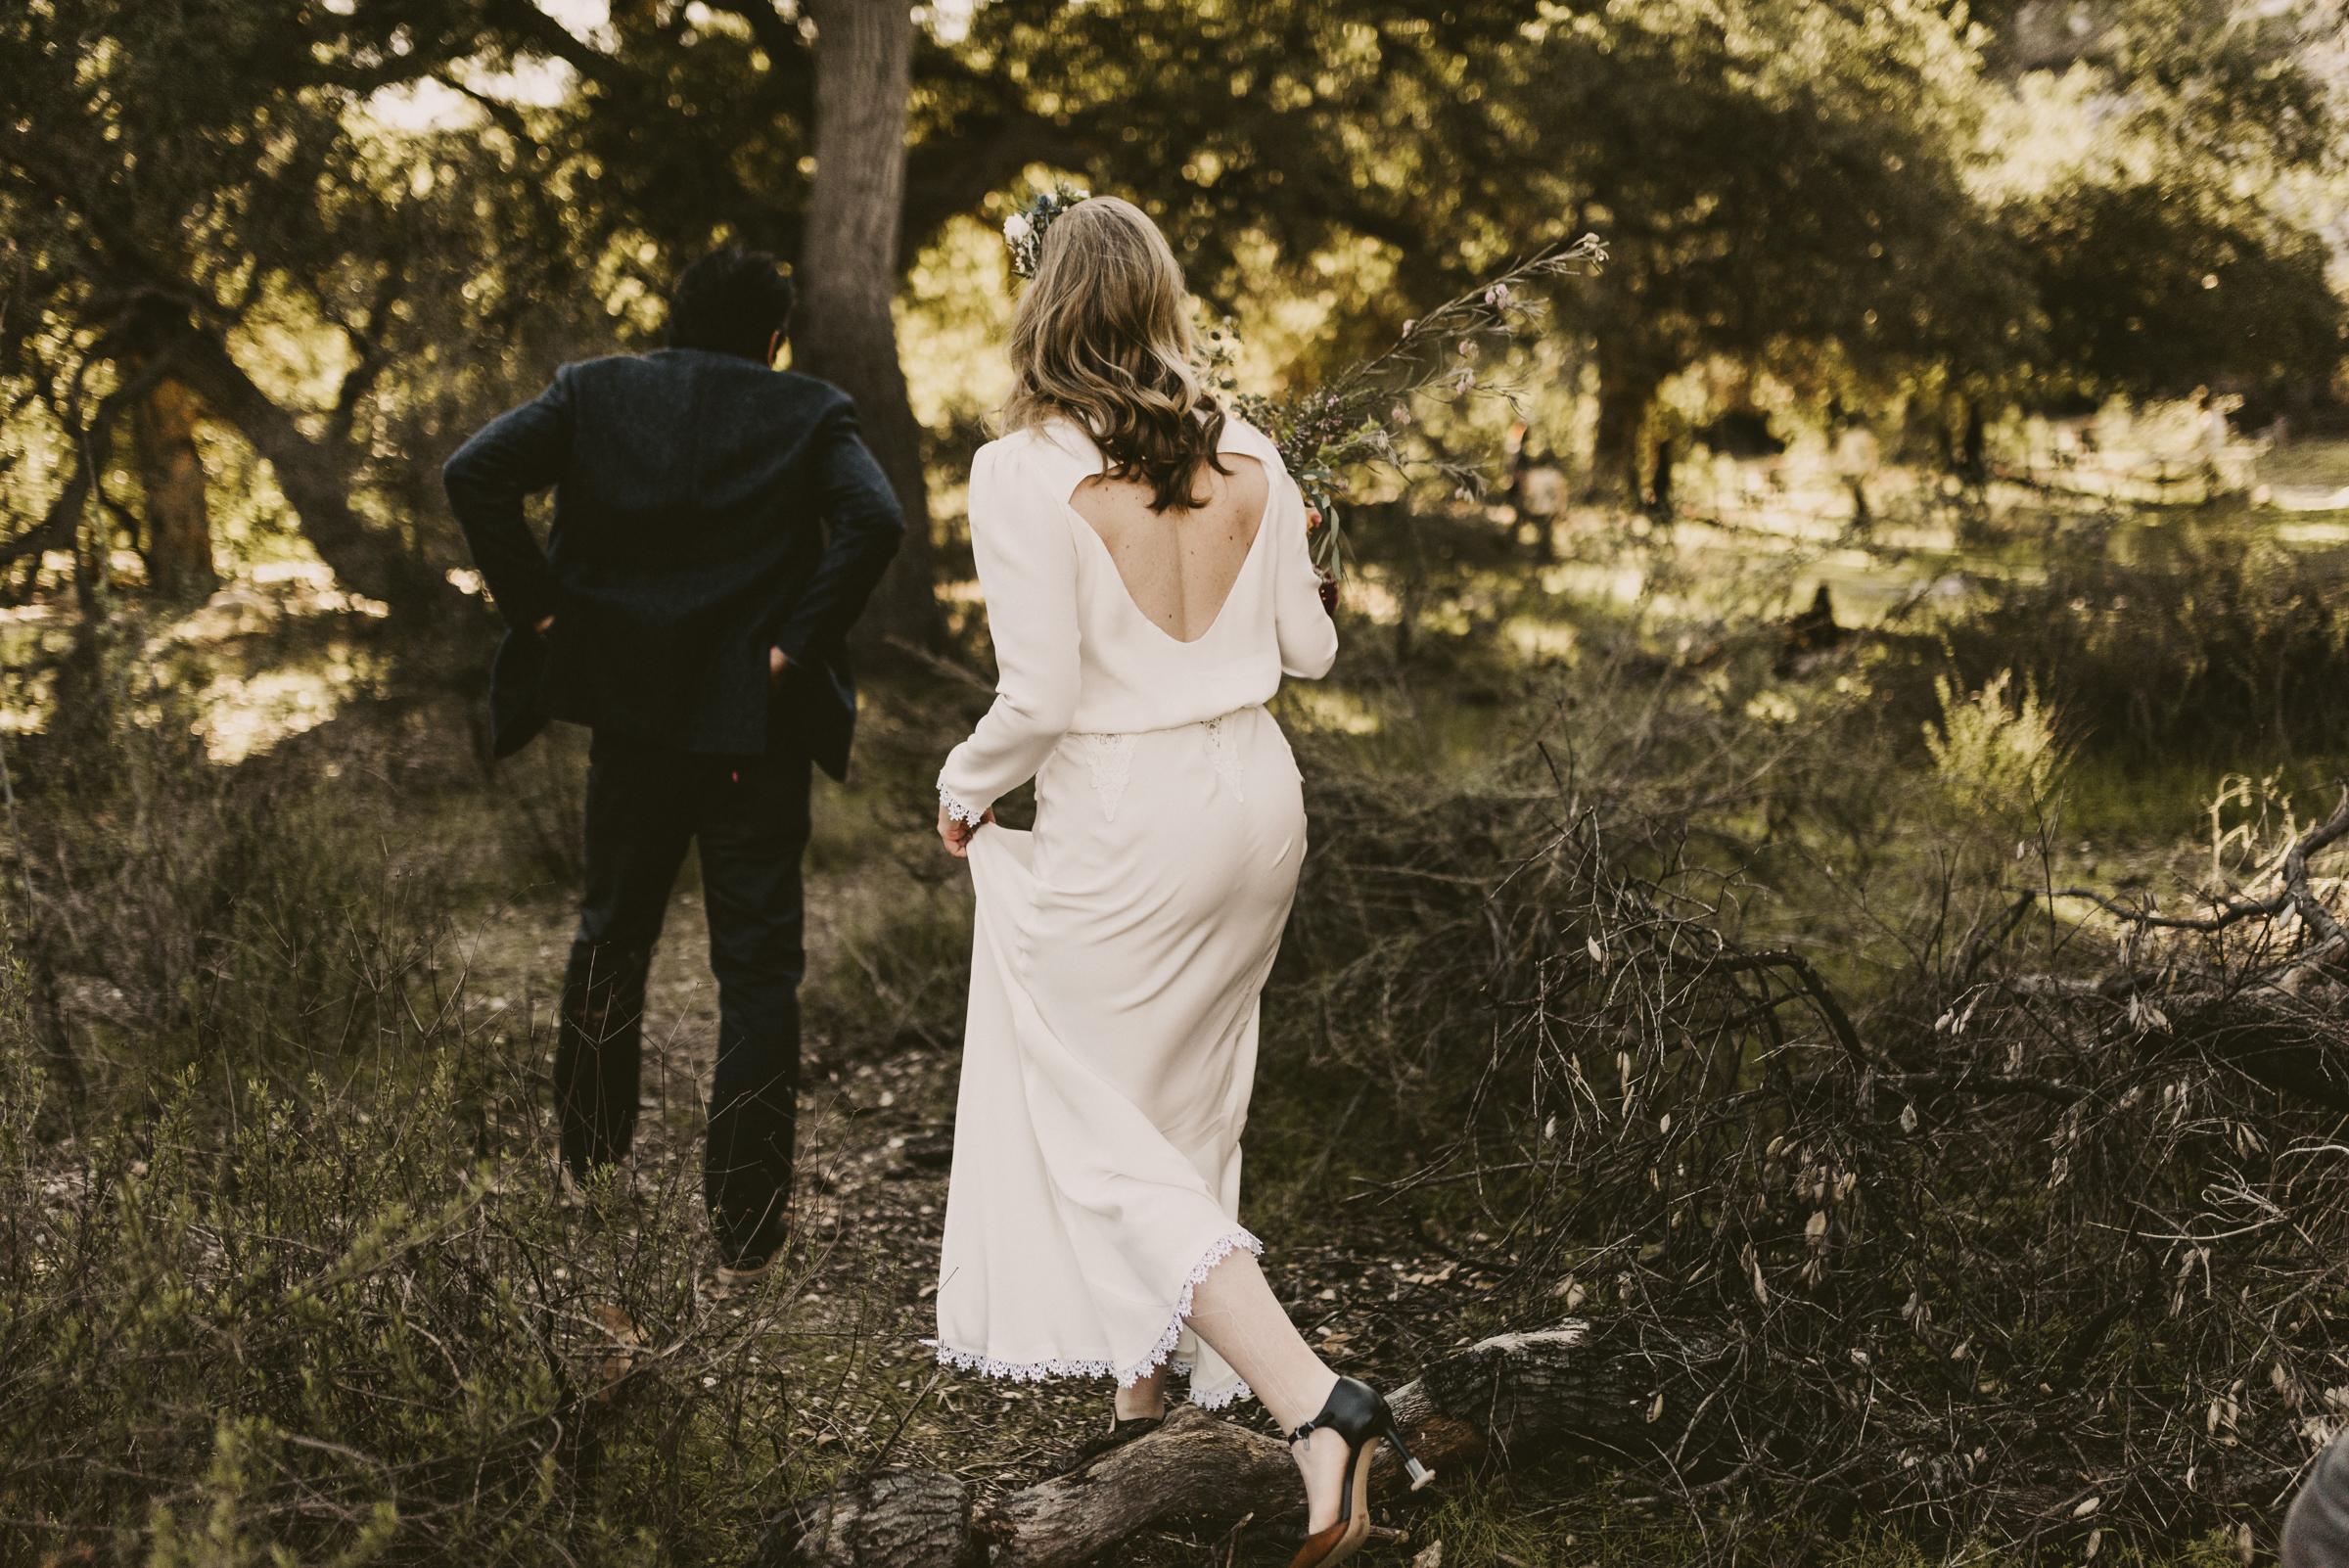 ©Isaiah + Taylor Photography - Intimate Elopement, Eaton Canyon, Los Angeles Wedding Photographer-33.jpg